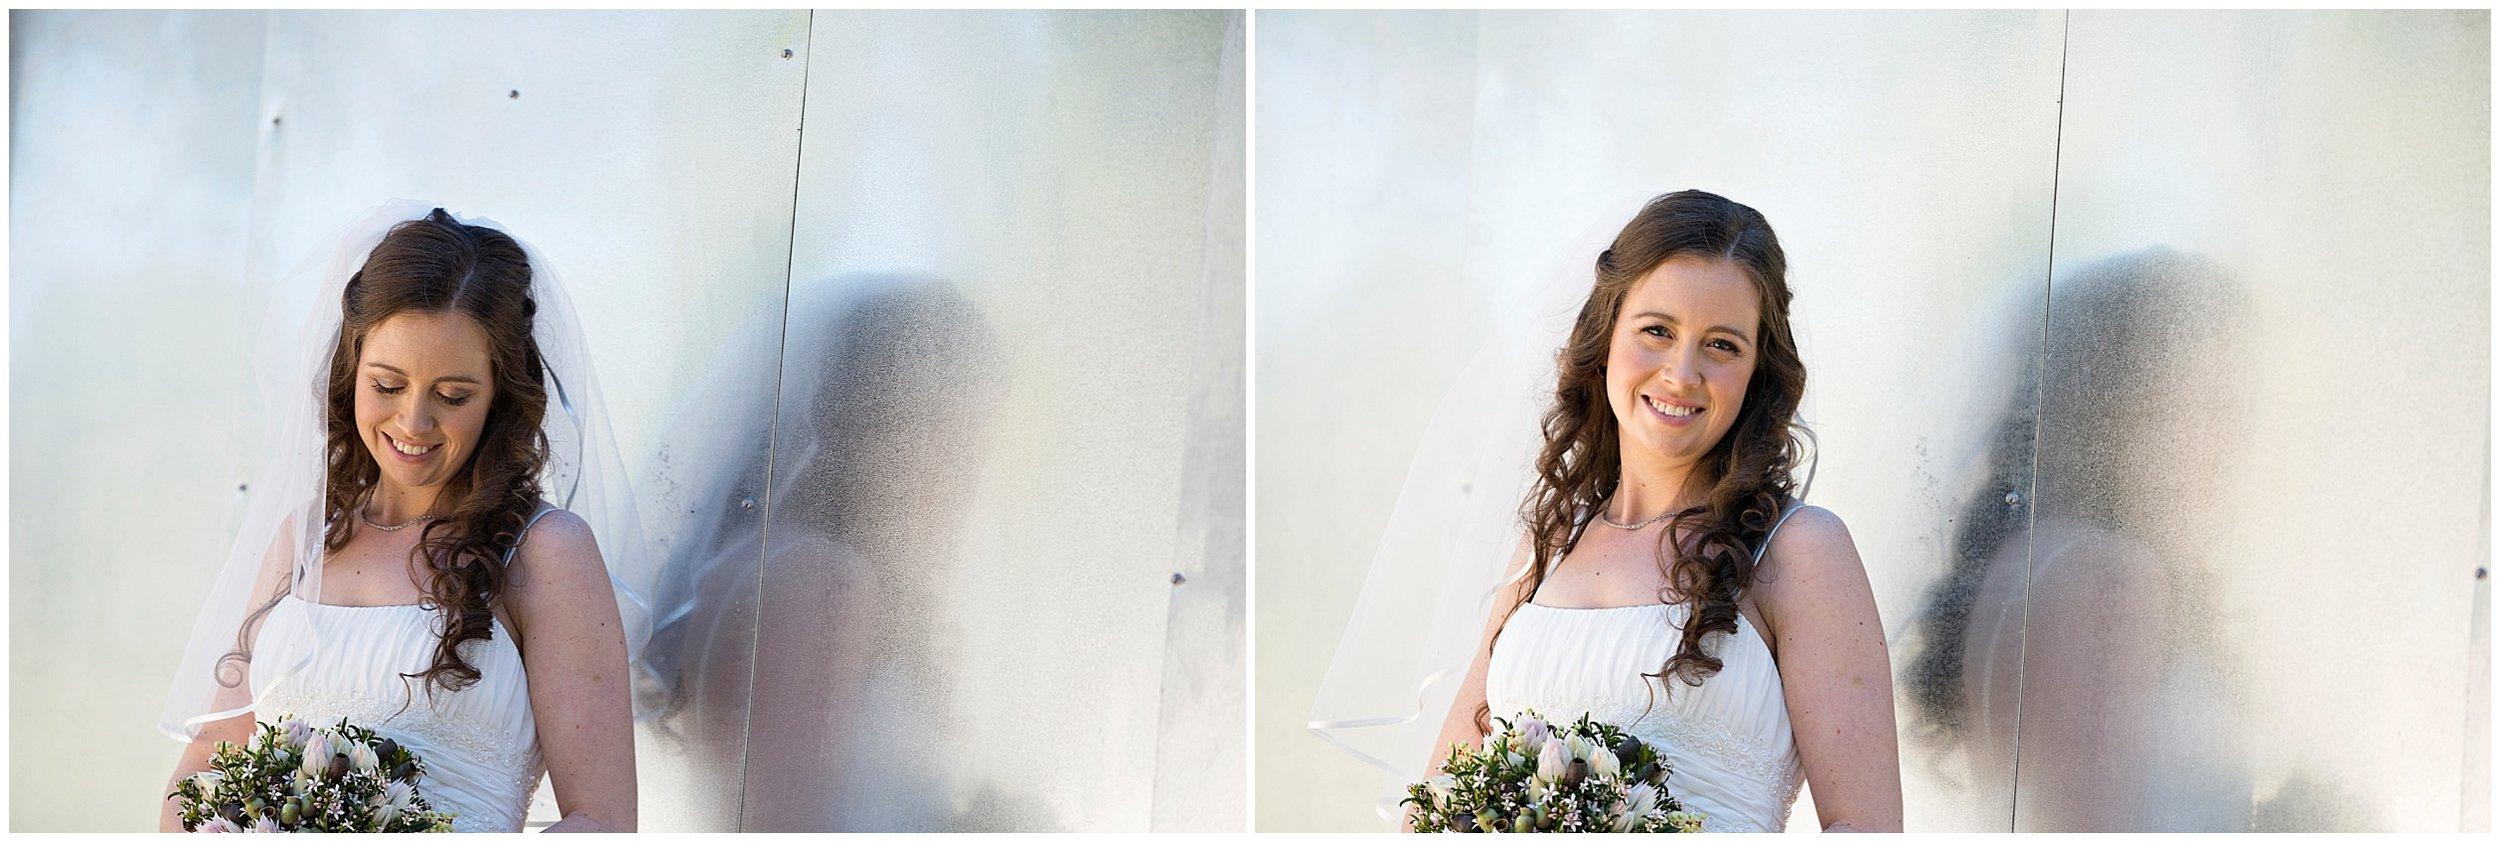 shepparton-wedding-photographer_0050.jpg